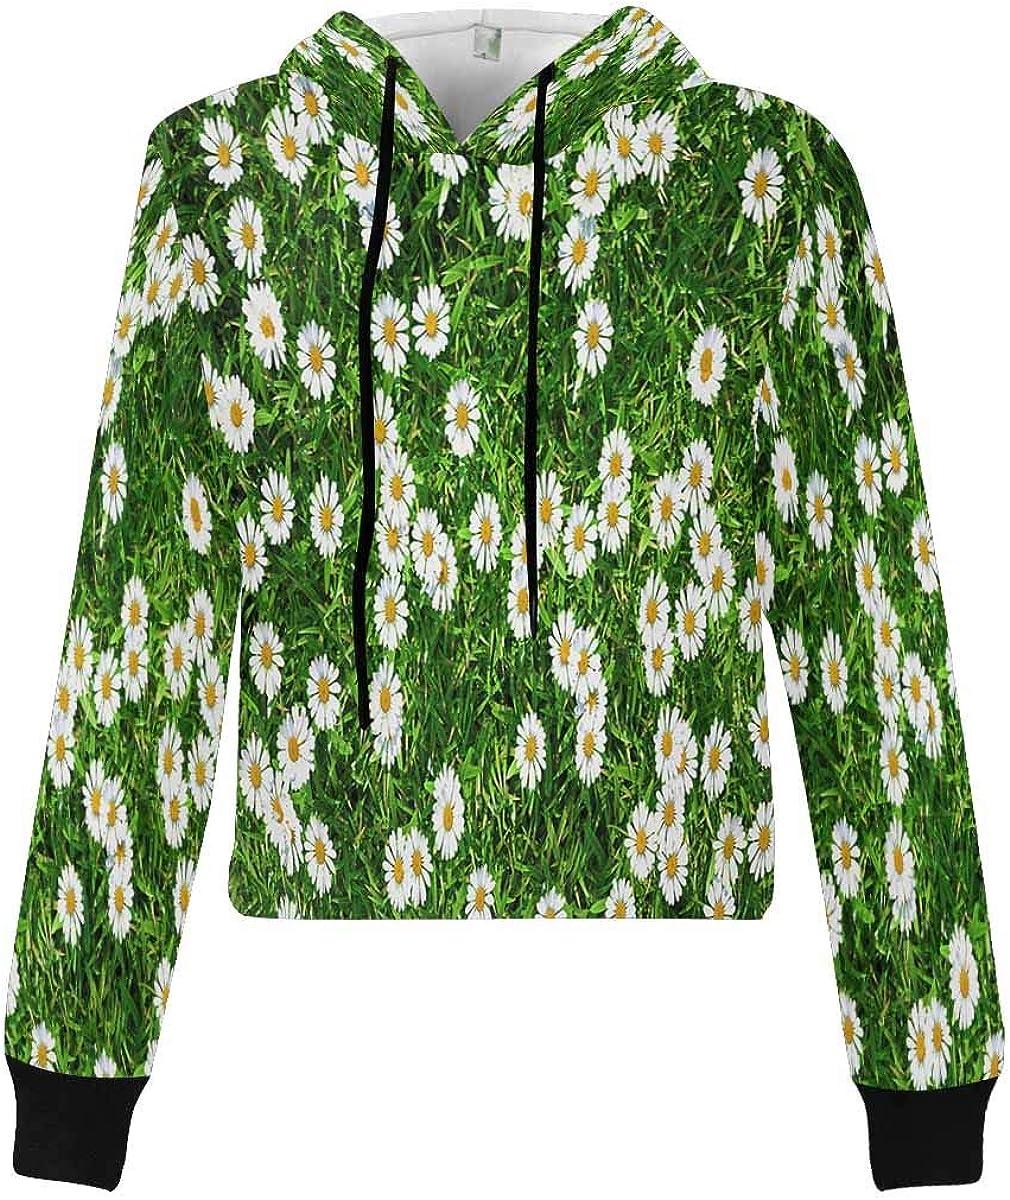 INTERESTPRINT Women Long Sleeve Pullover Hooded Sweatshirt Casual Loose Crop Top Shirt XS~2XL